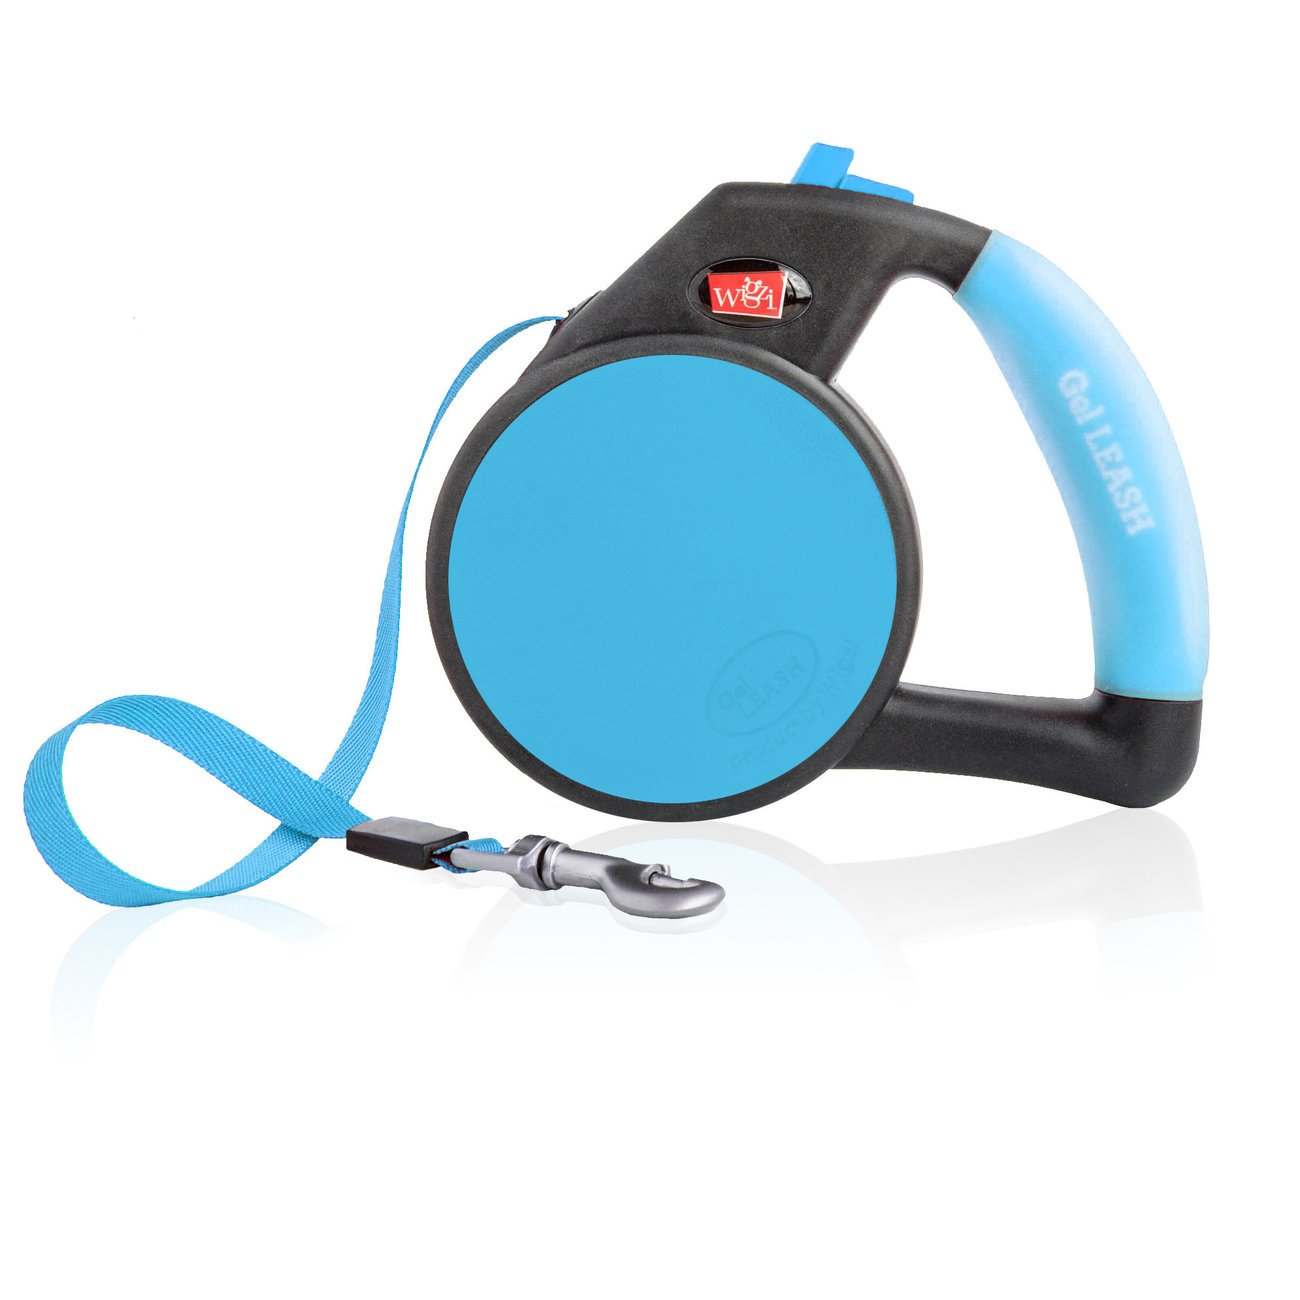 Wigzi Automatik-Hundeleine mit Gel Handgriff, Gr. S - blau